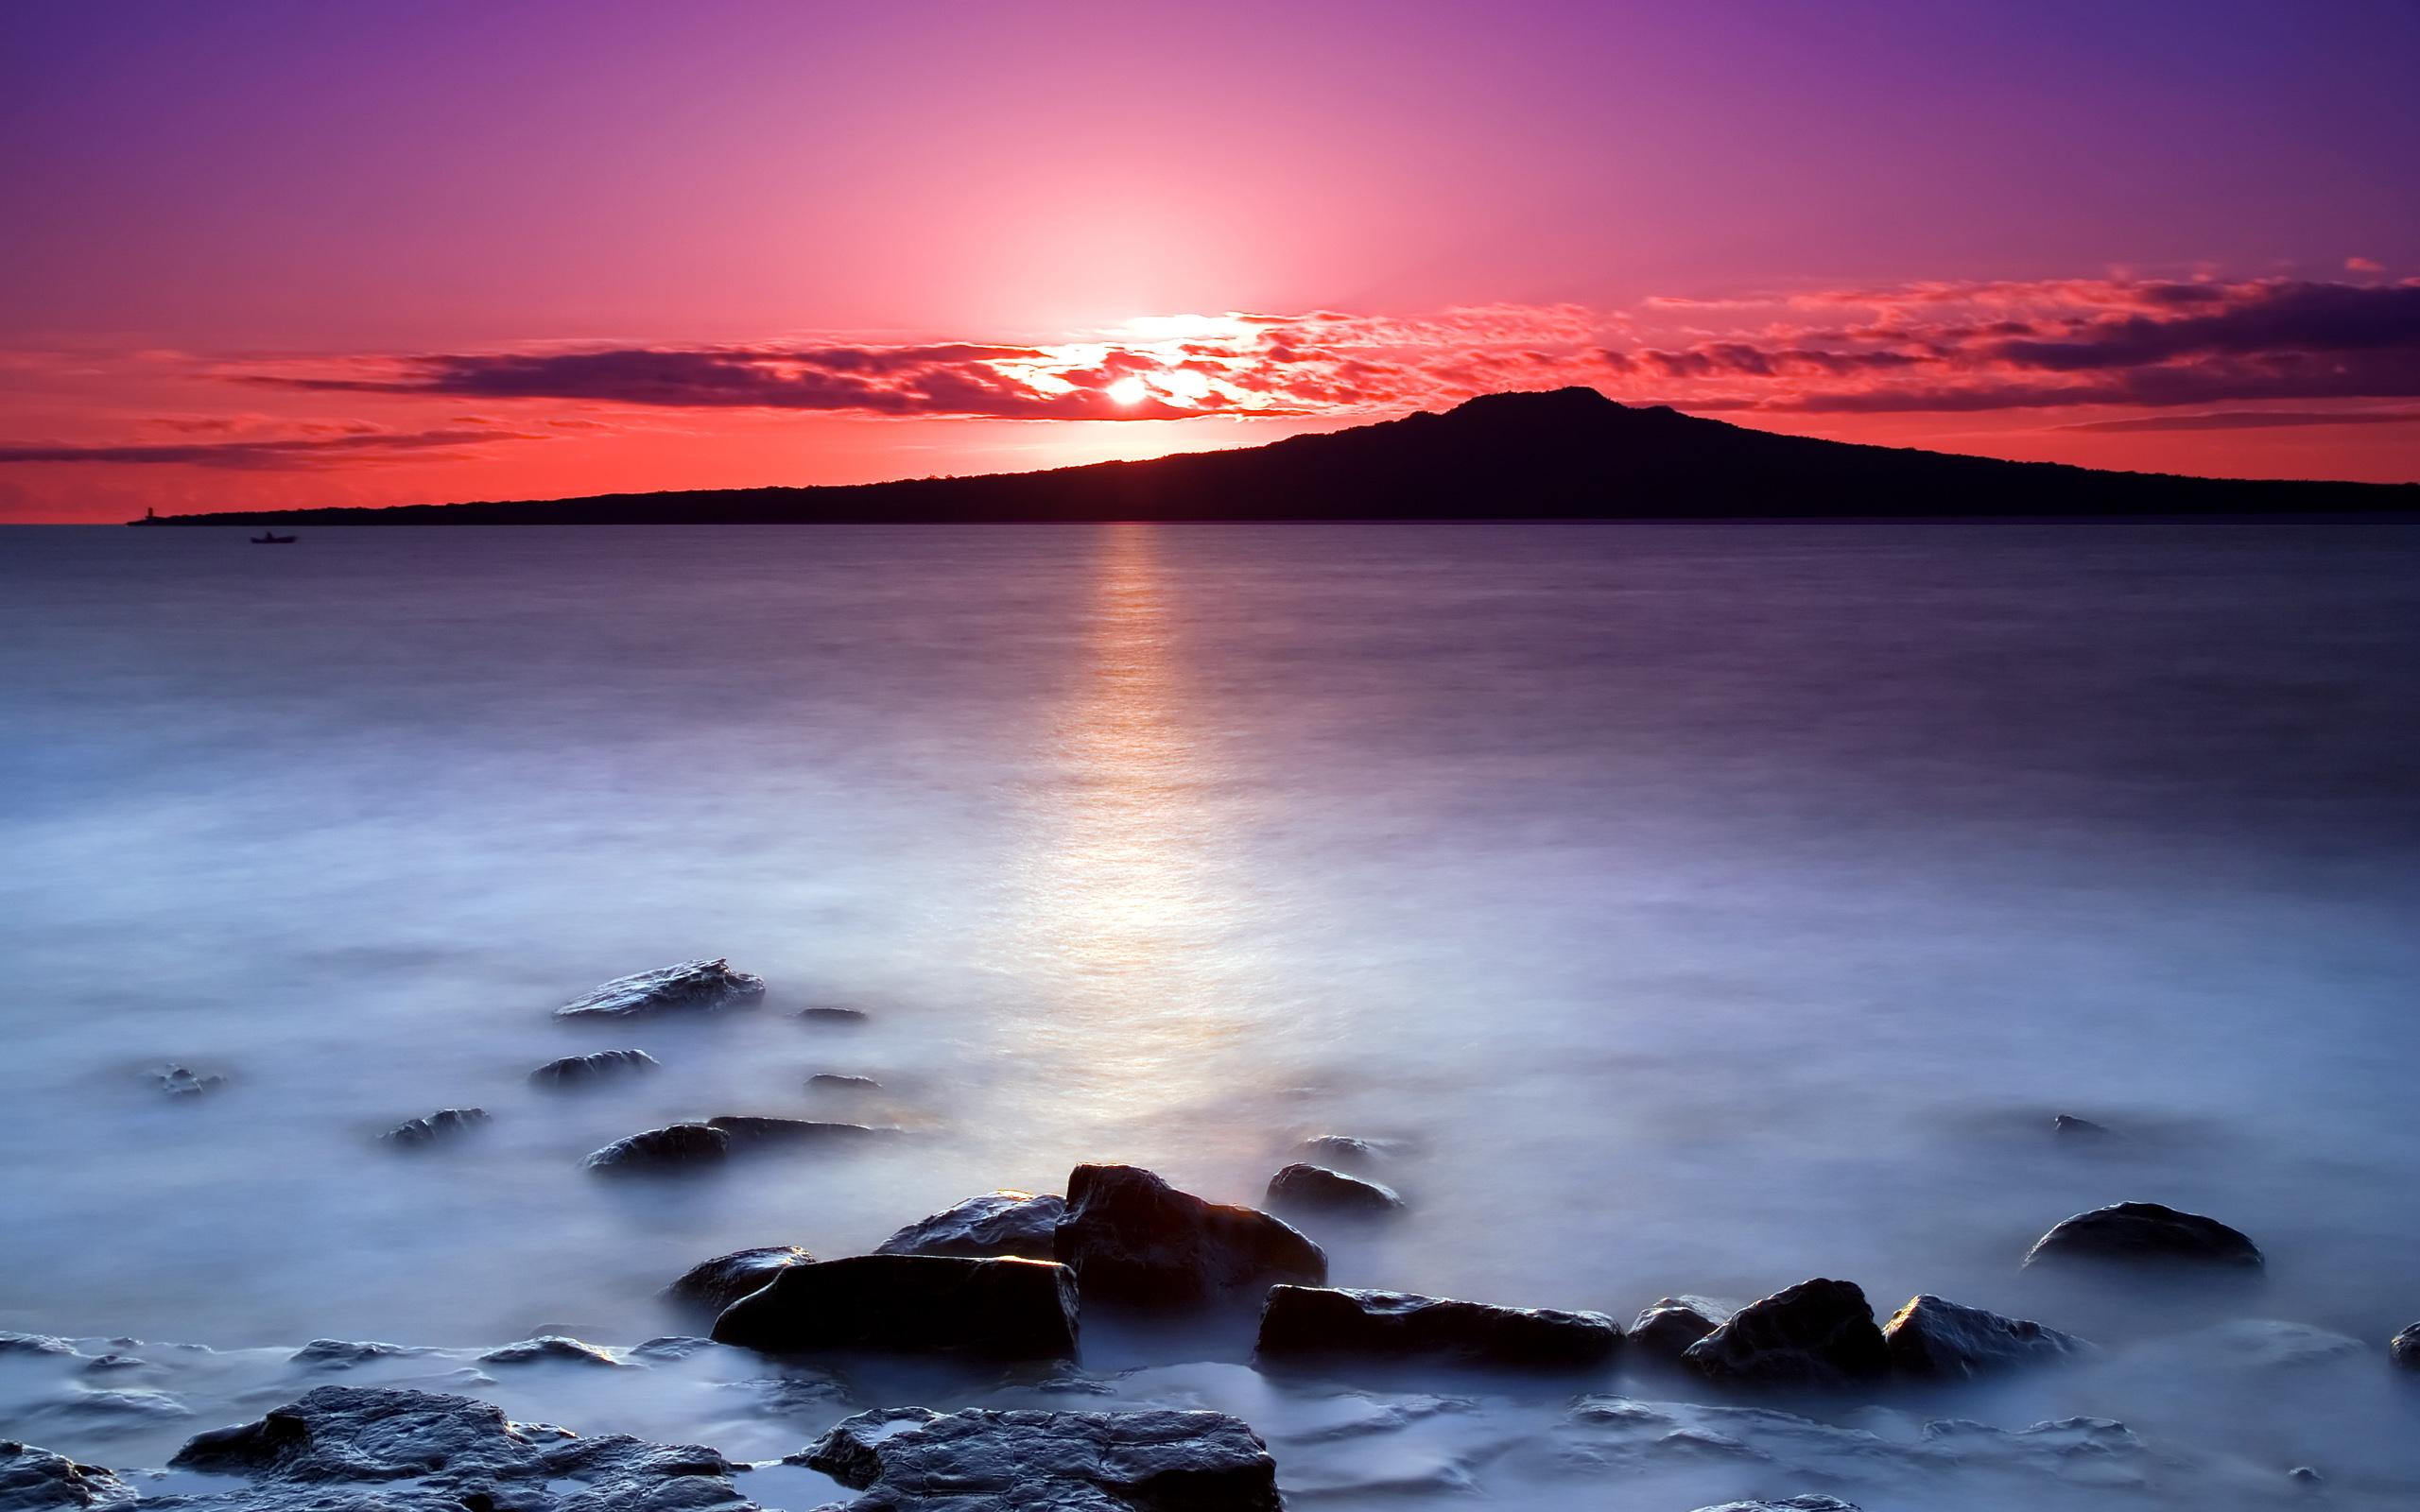 закат горы небо вода  № 1019662 бесплатно